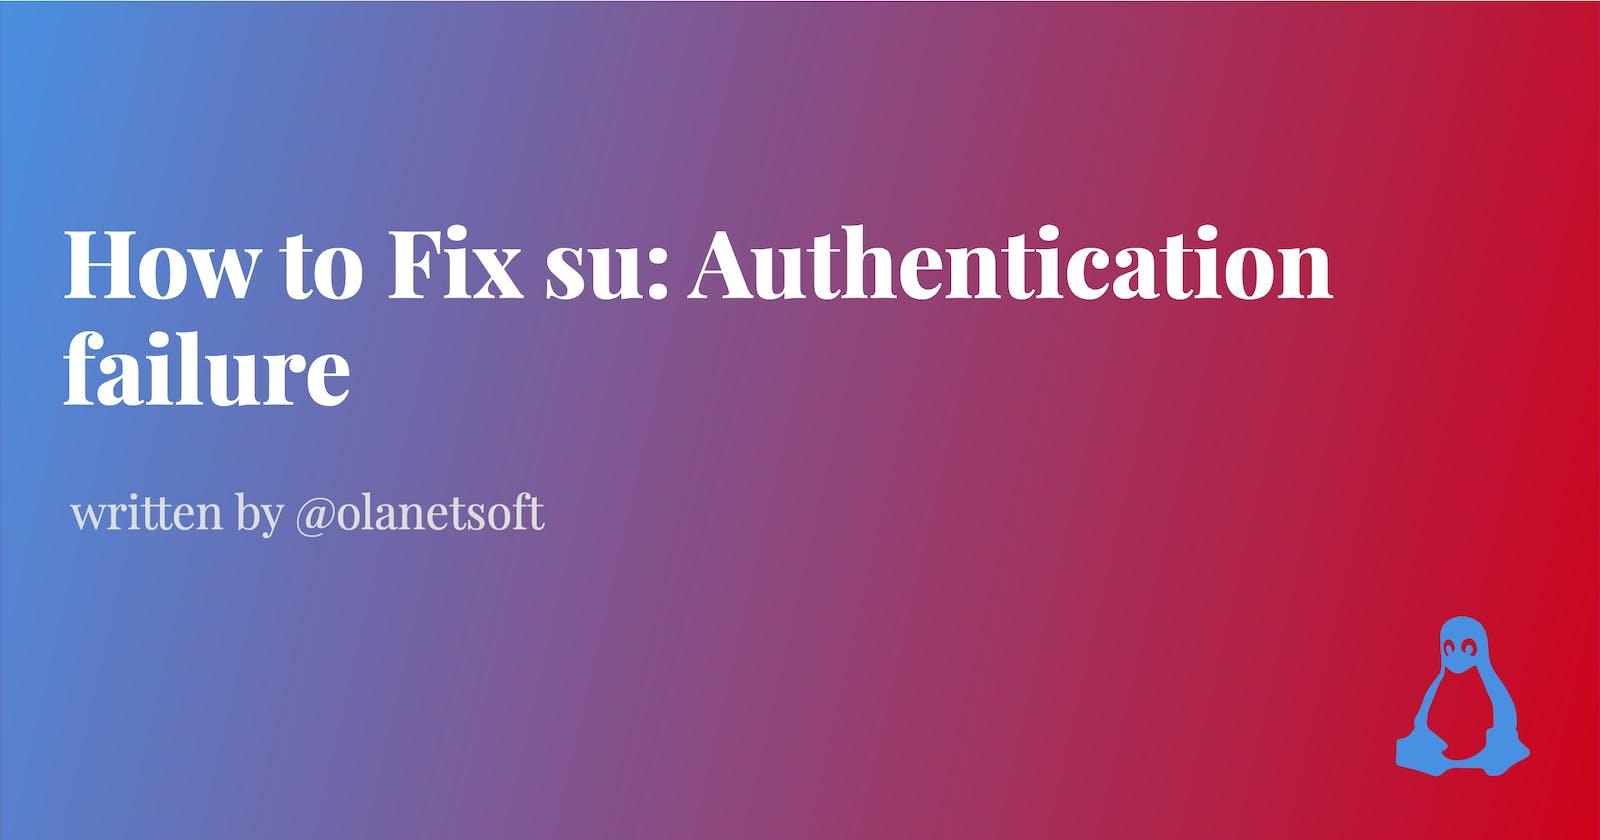 How to fix su: Authentication failure